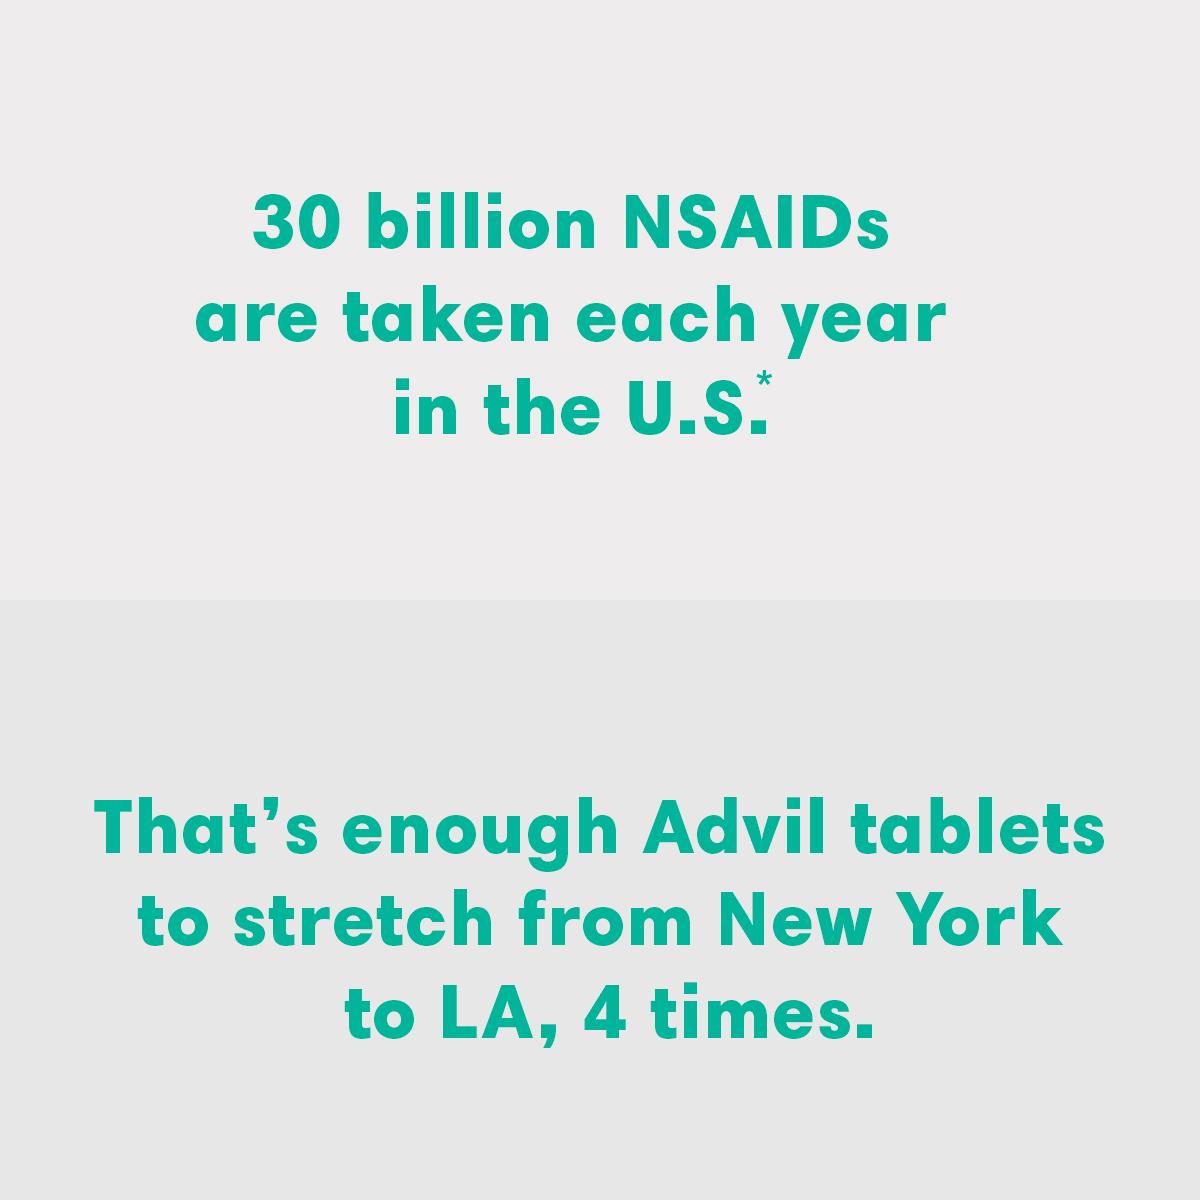 30 billion NSAIDs